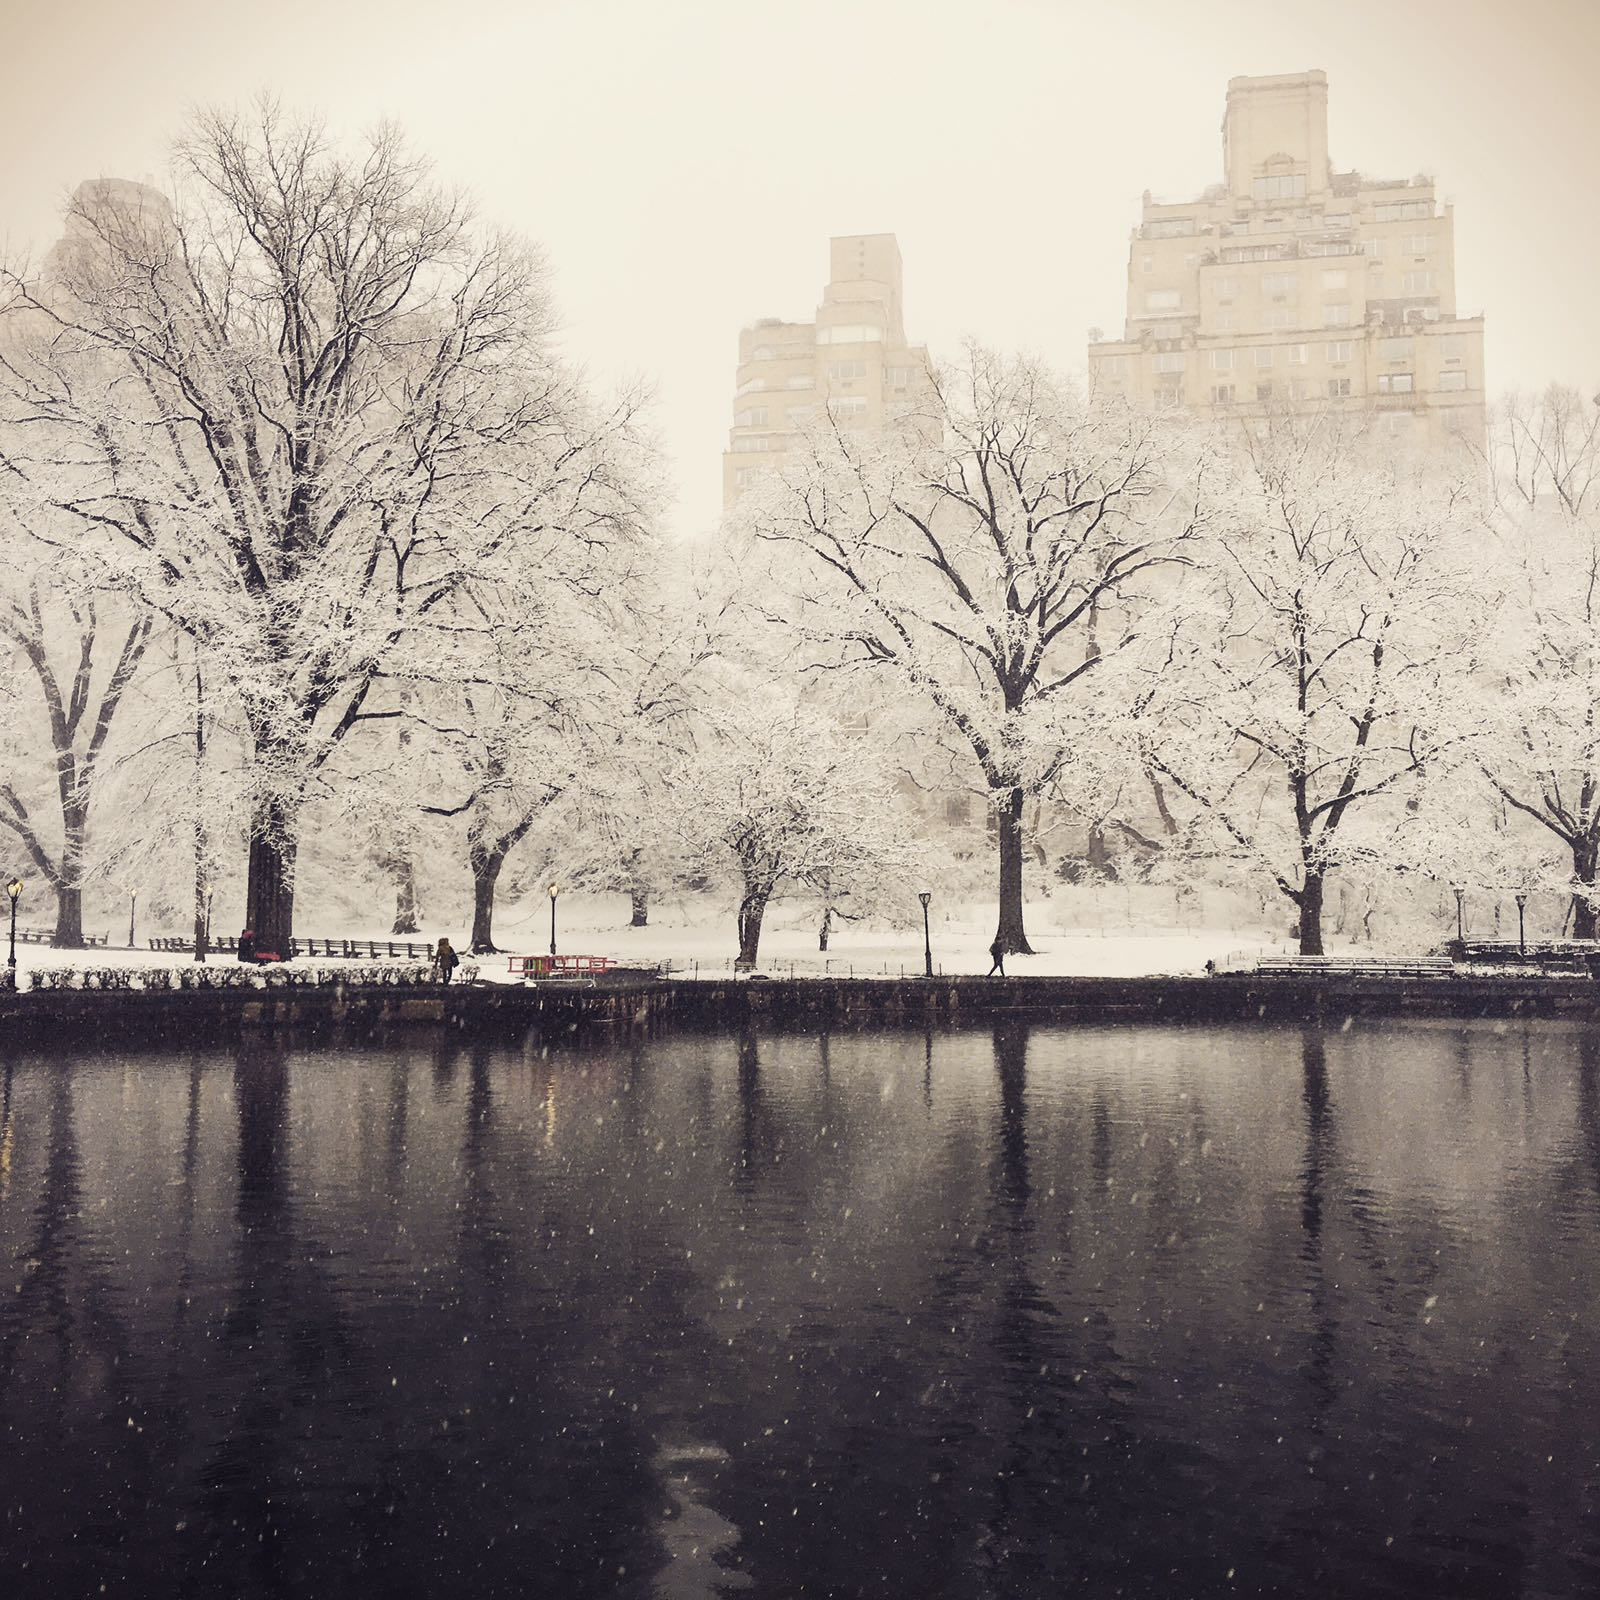 Grand Central in New York. (Photo by Ceyda Erdinc)